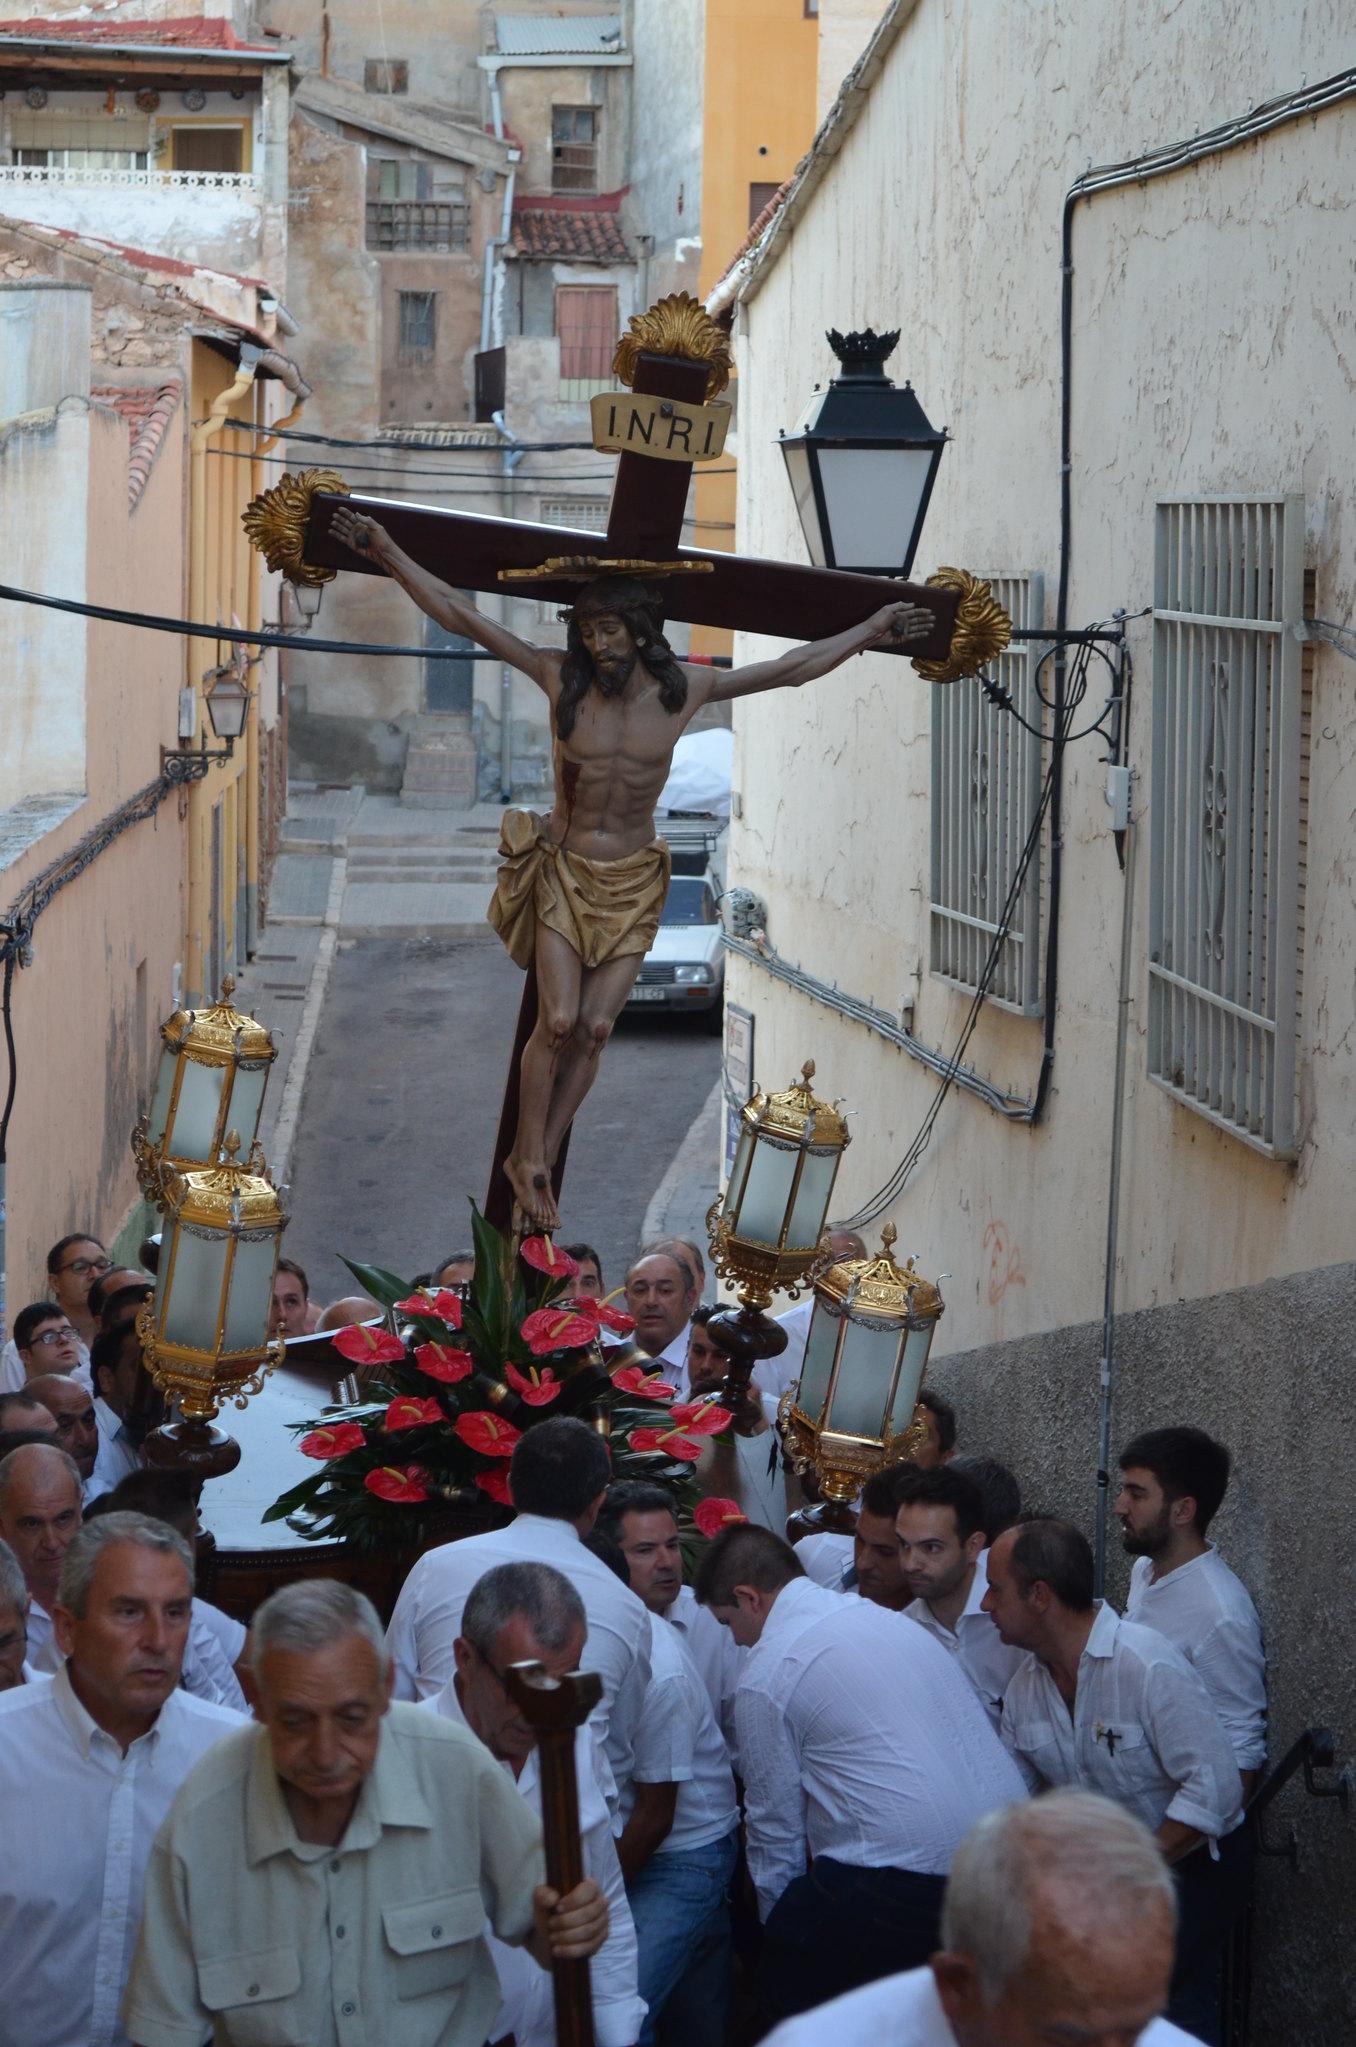 (2017-07-02) Procesión de subida - Pere Sánchez Falco (04)